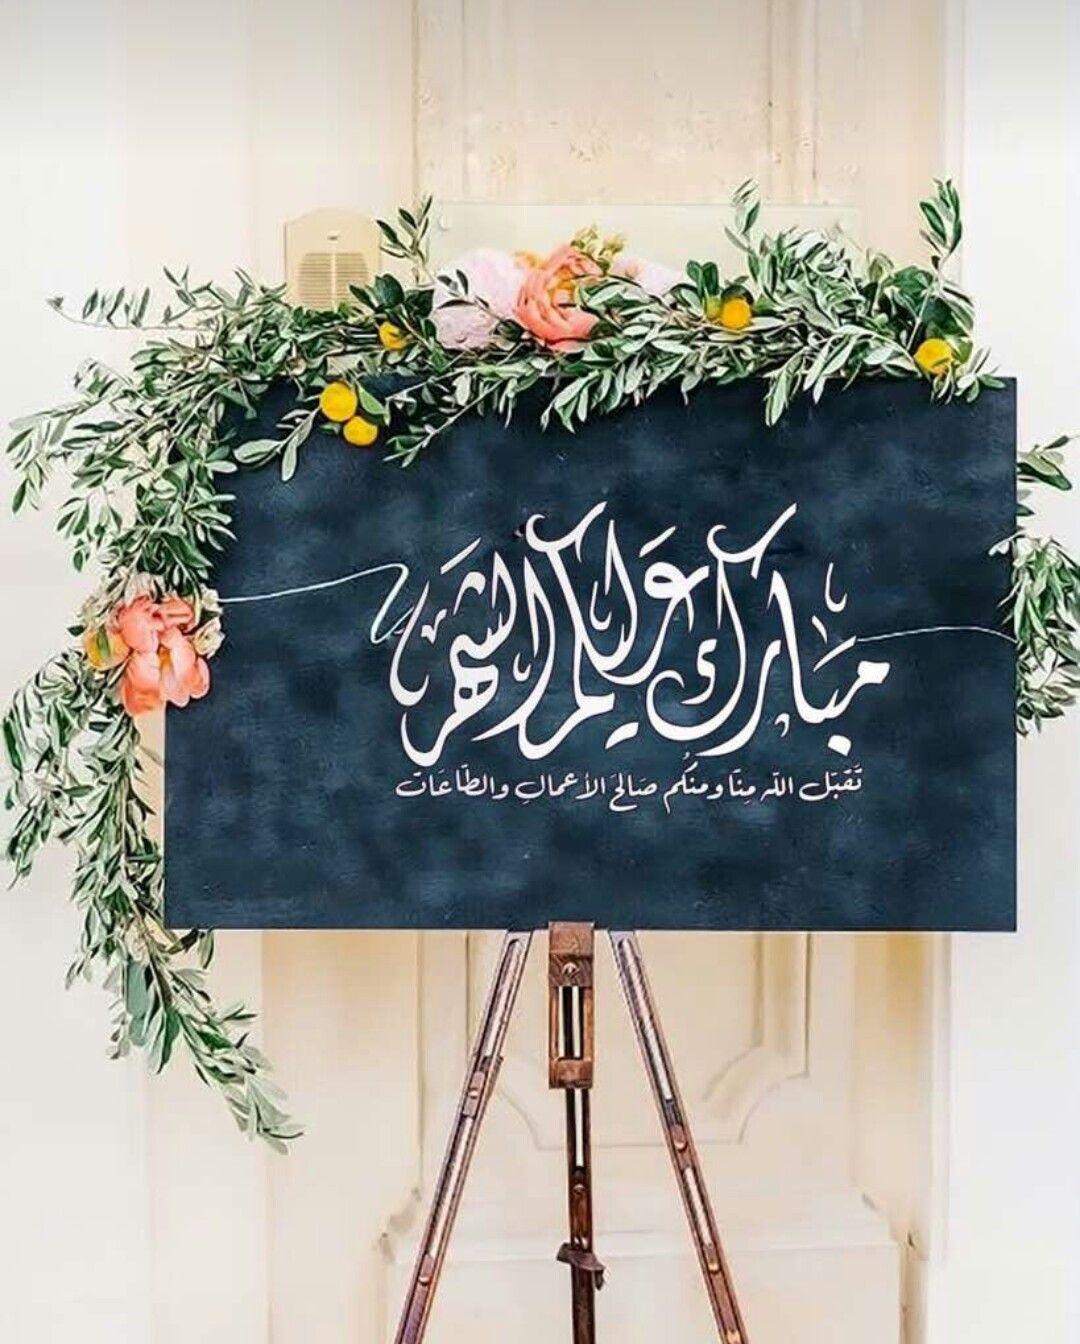 Pin By Hedia Dridi Rafrafi On مبارك عليكم الشهر الفضيل Ramadan Decorations Ramadan Greetings School Art Activities